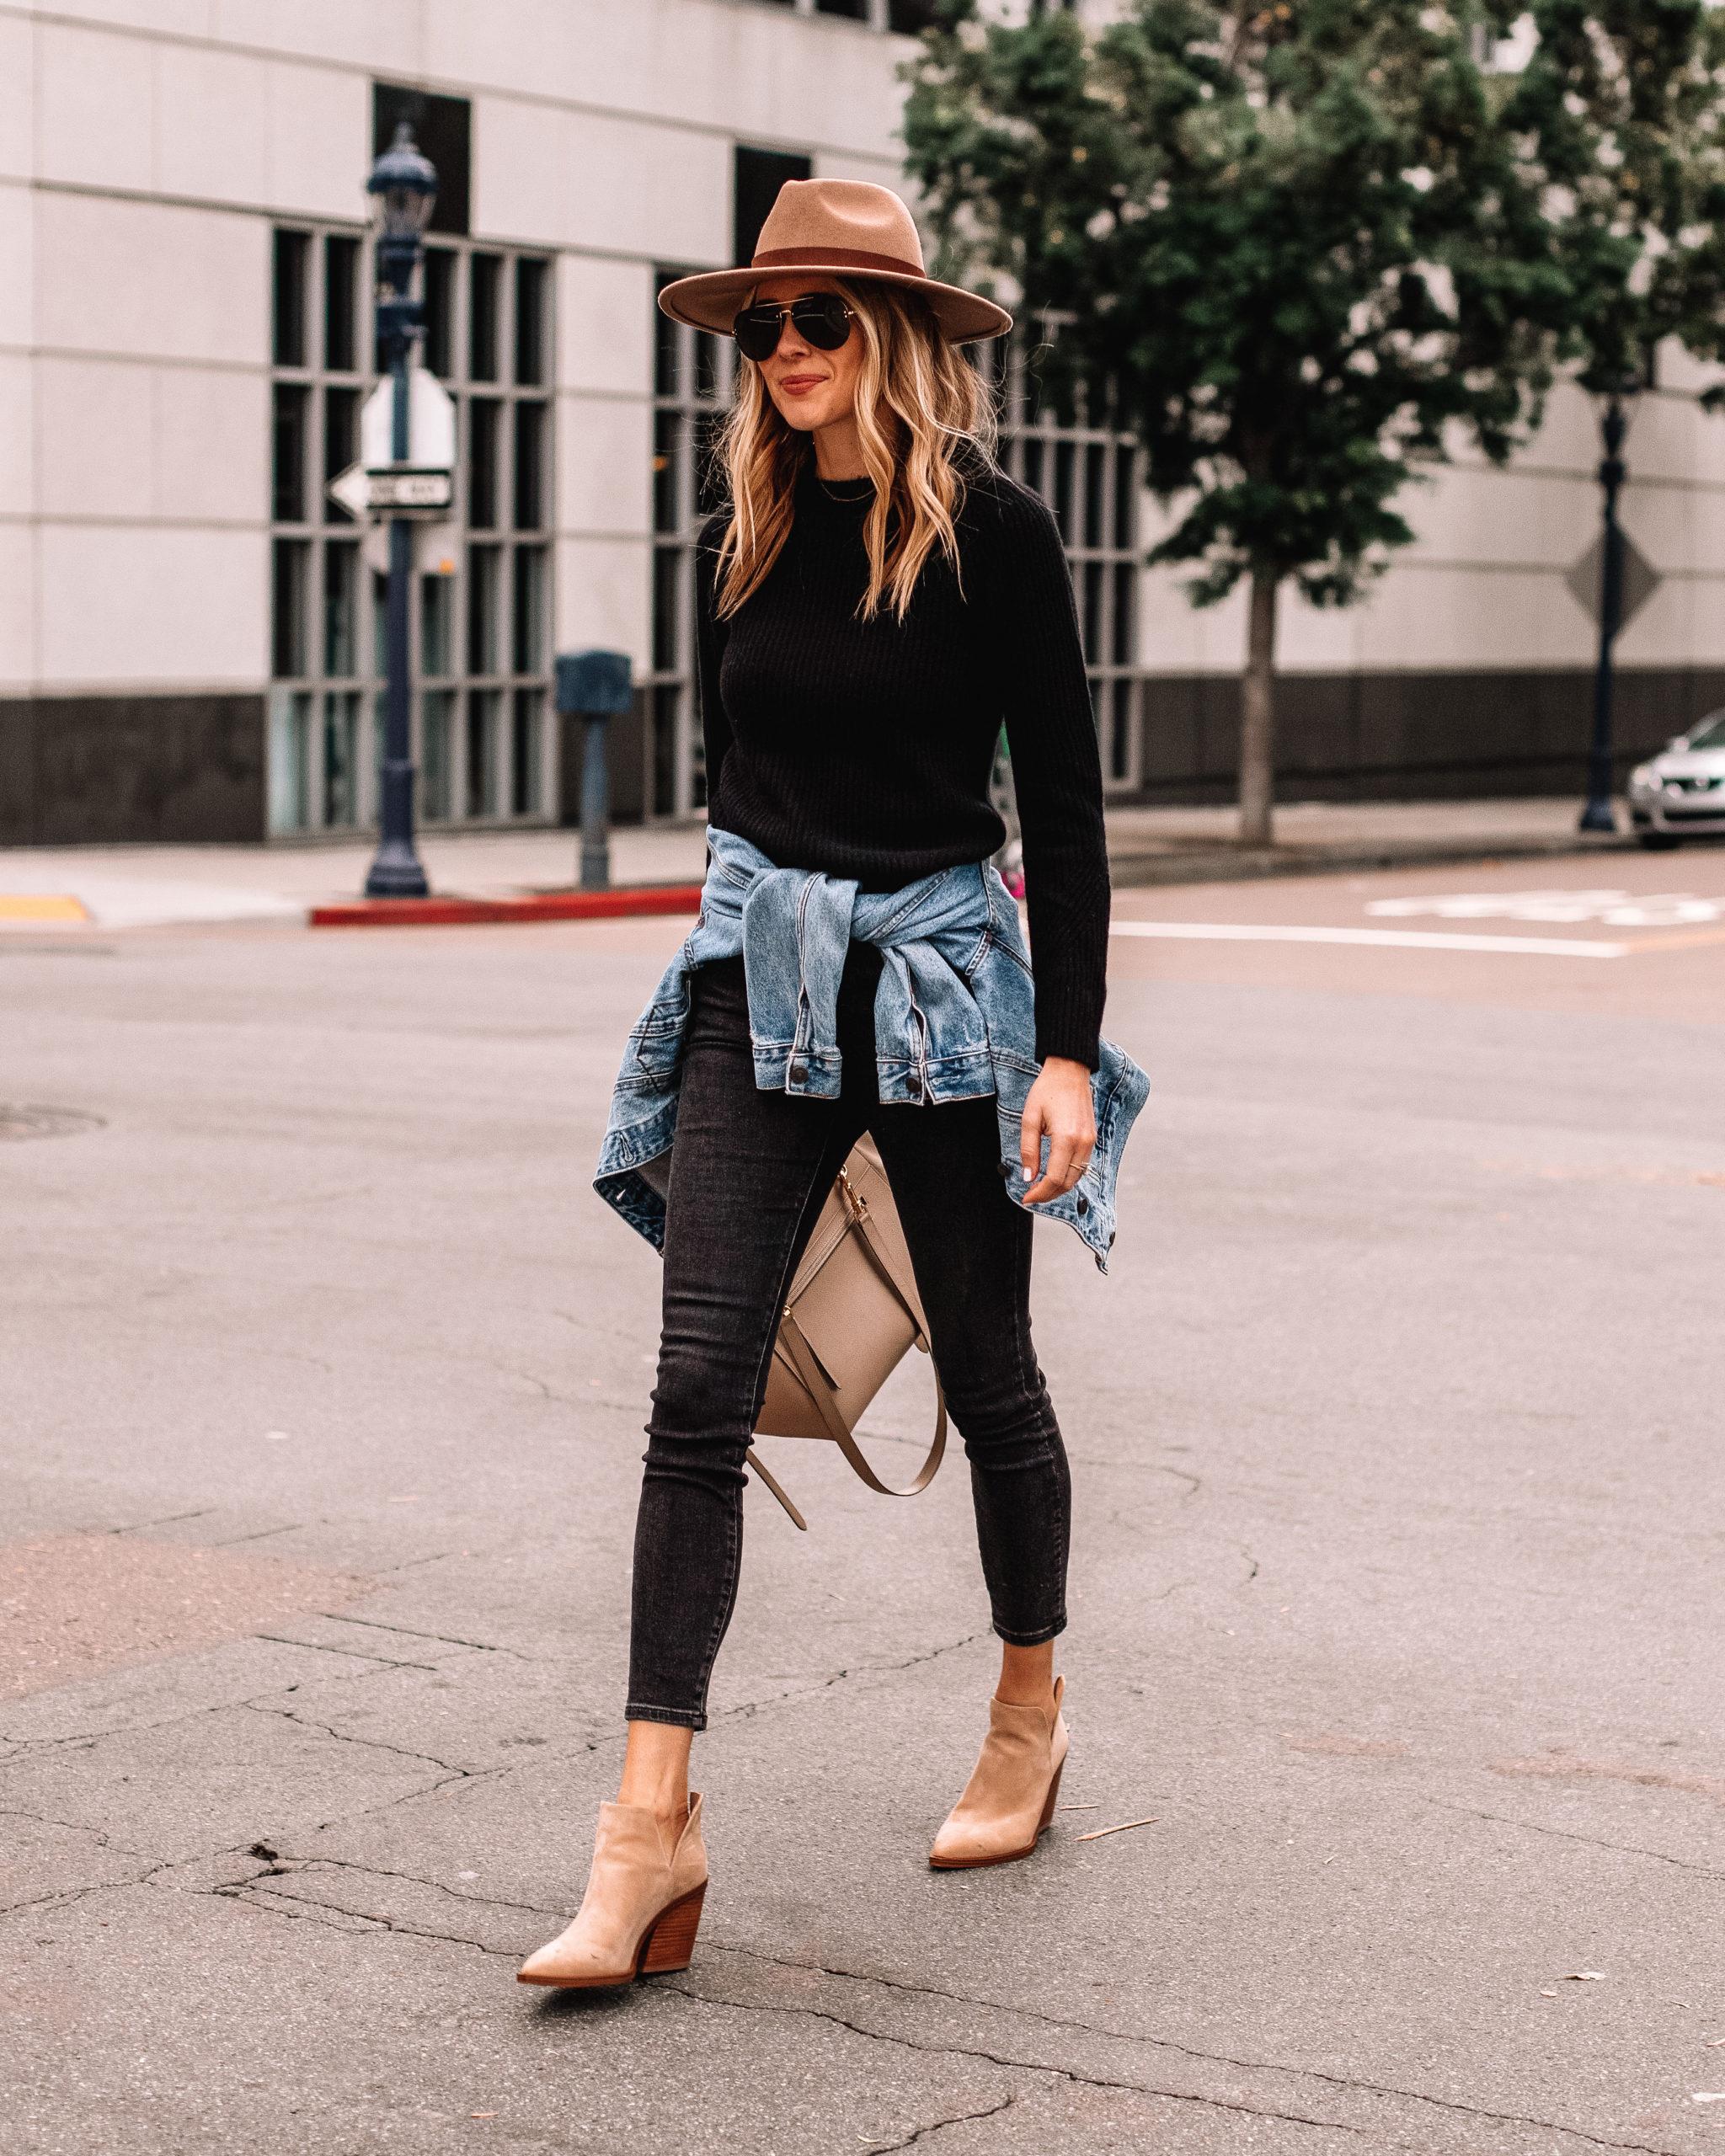 Fashion Jackson Wearing Black Sweater Black Jeans Tan Booties Denim Jacket Brown Wide Brim Hat